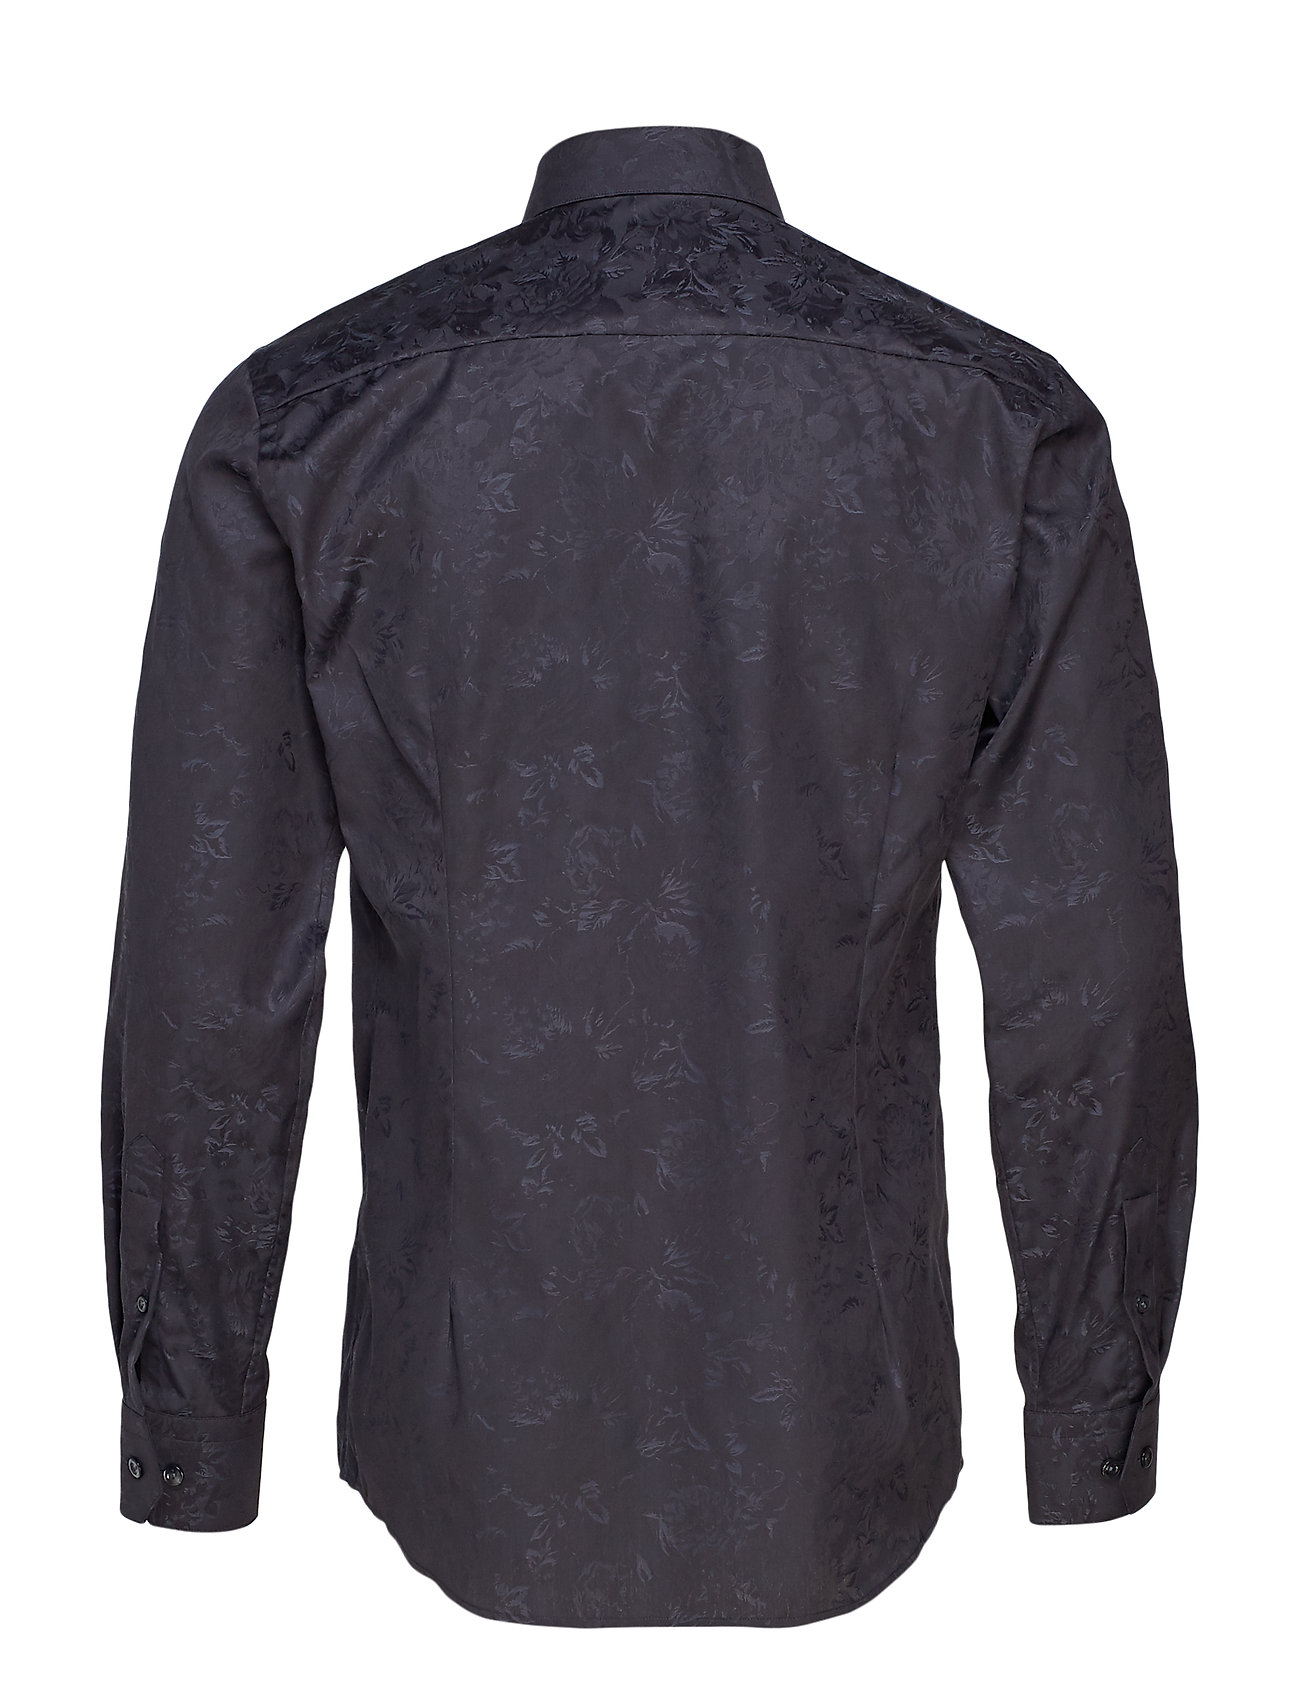 Jacquard Black Black Black Tuxedo Tuxedo Jacquard Tuxedo ShirtblackEton ShirtblackEton Tuxedo ShirtblackEton Black Jacquard Jacquard bgyfIY6vm7